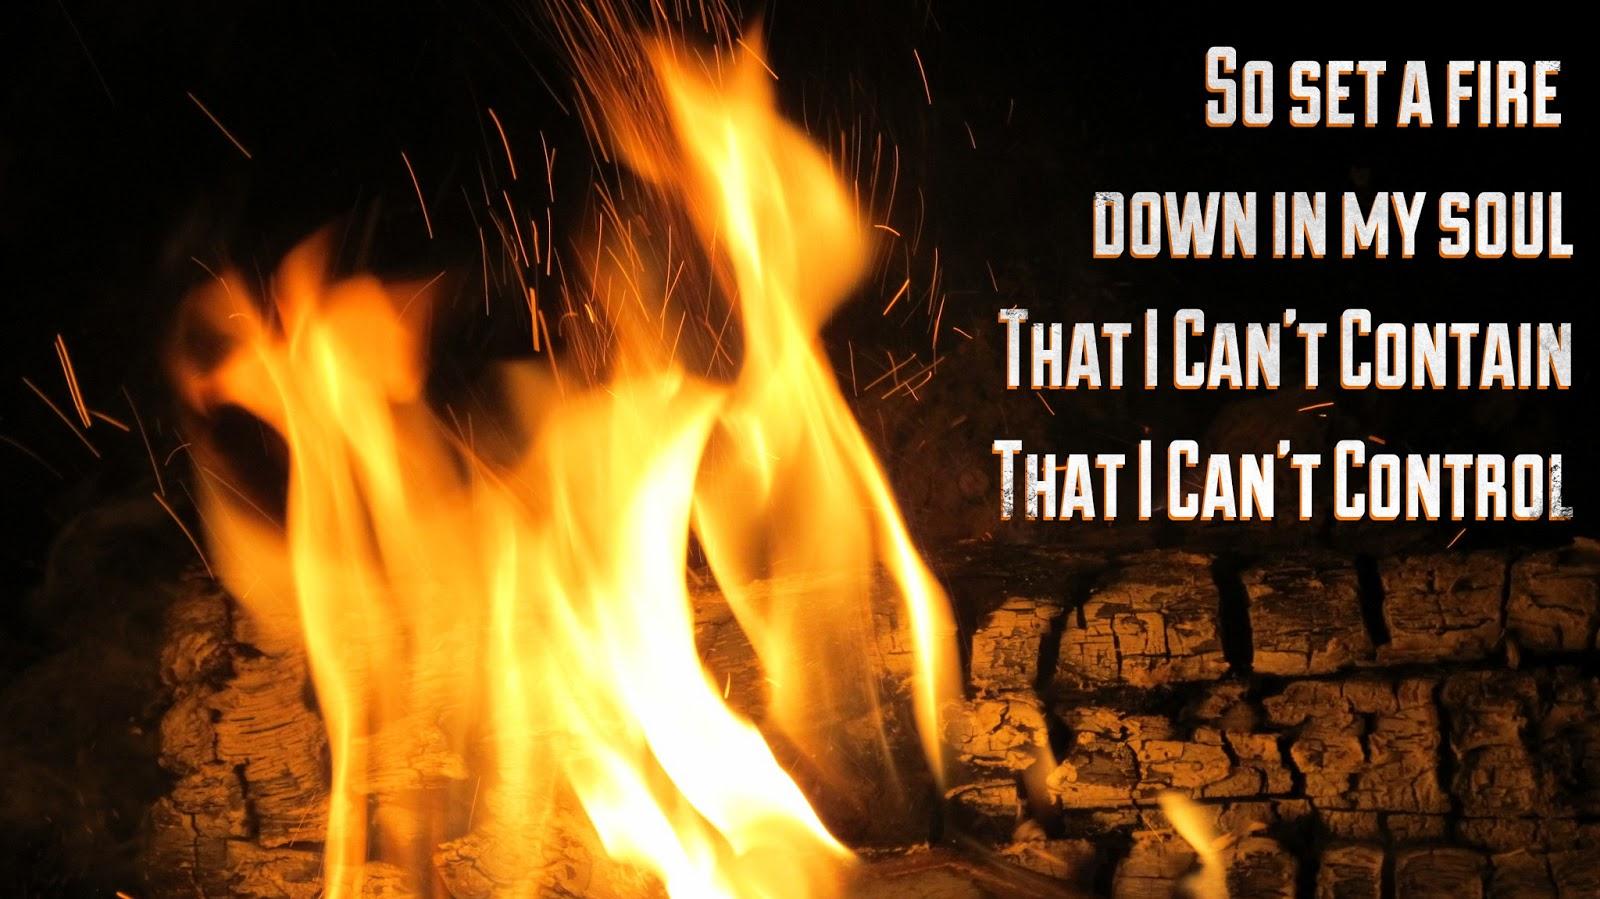 Pyrotechnics quote #1